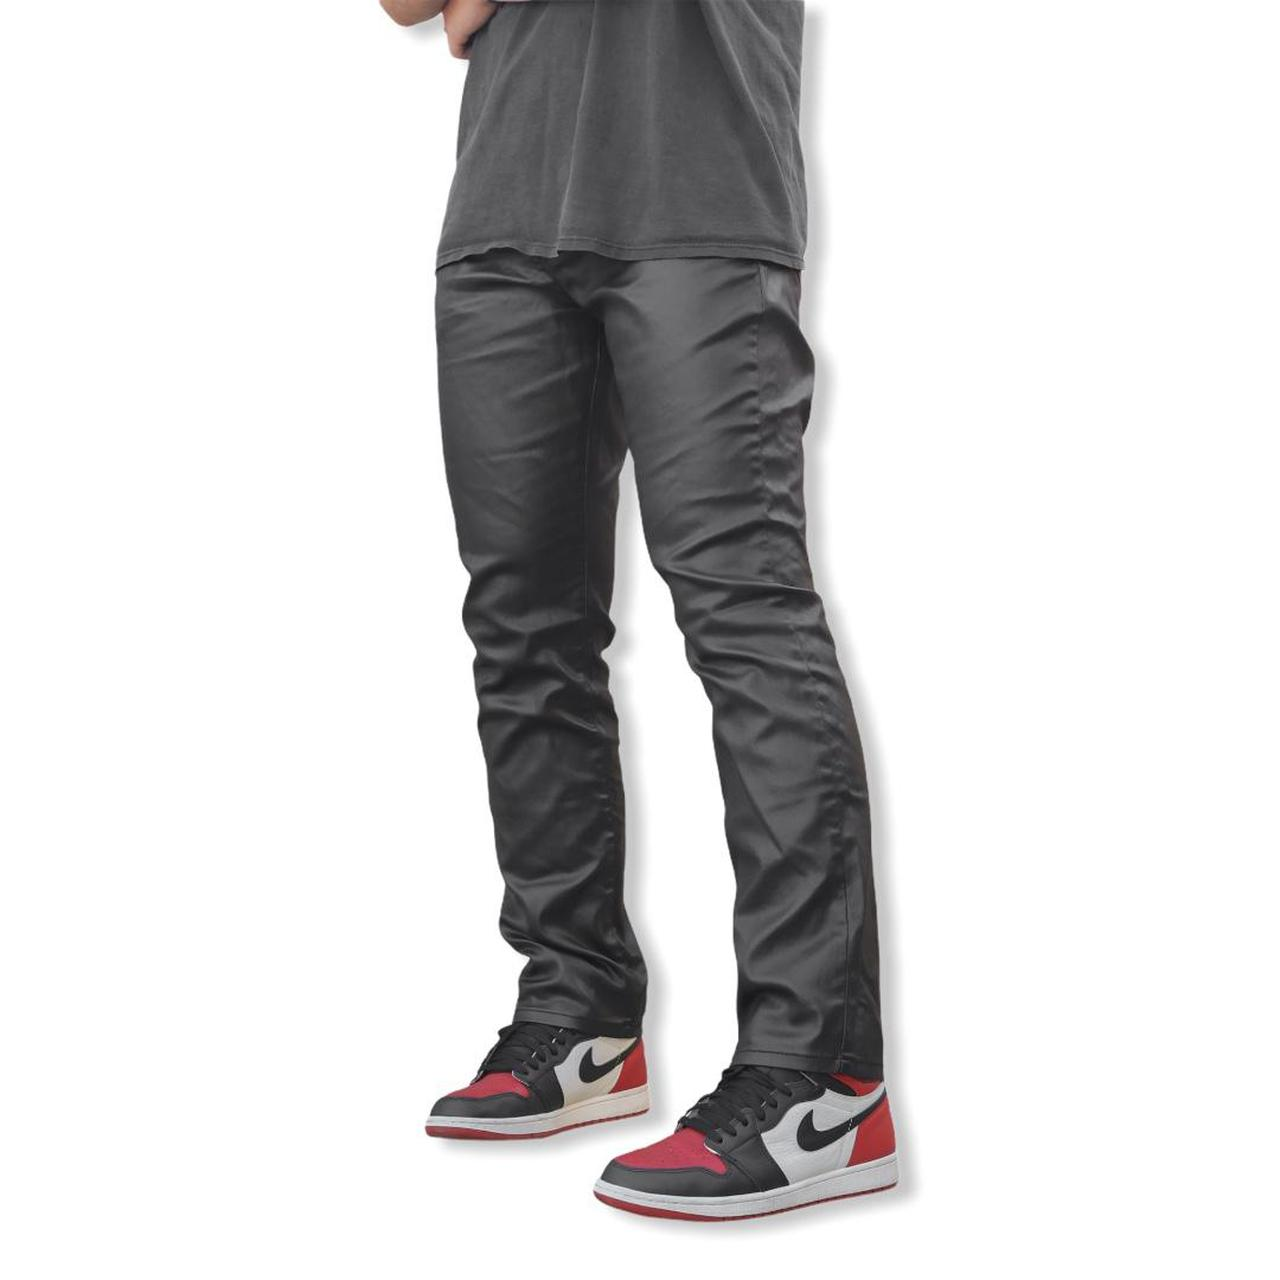 Product Image 1 - Leather Pants Black • Slim fit •